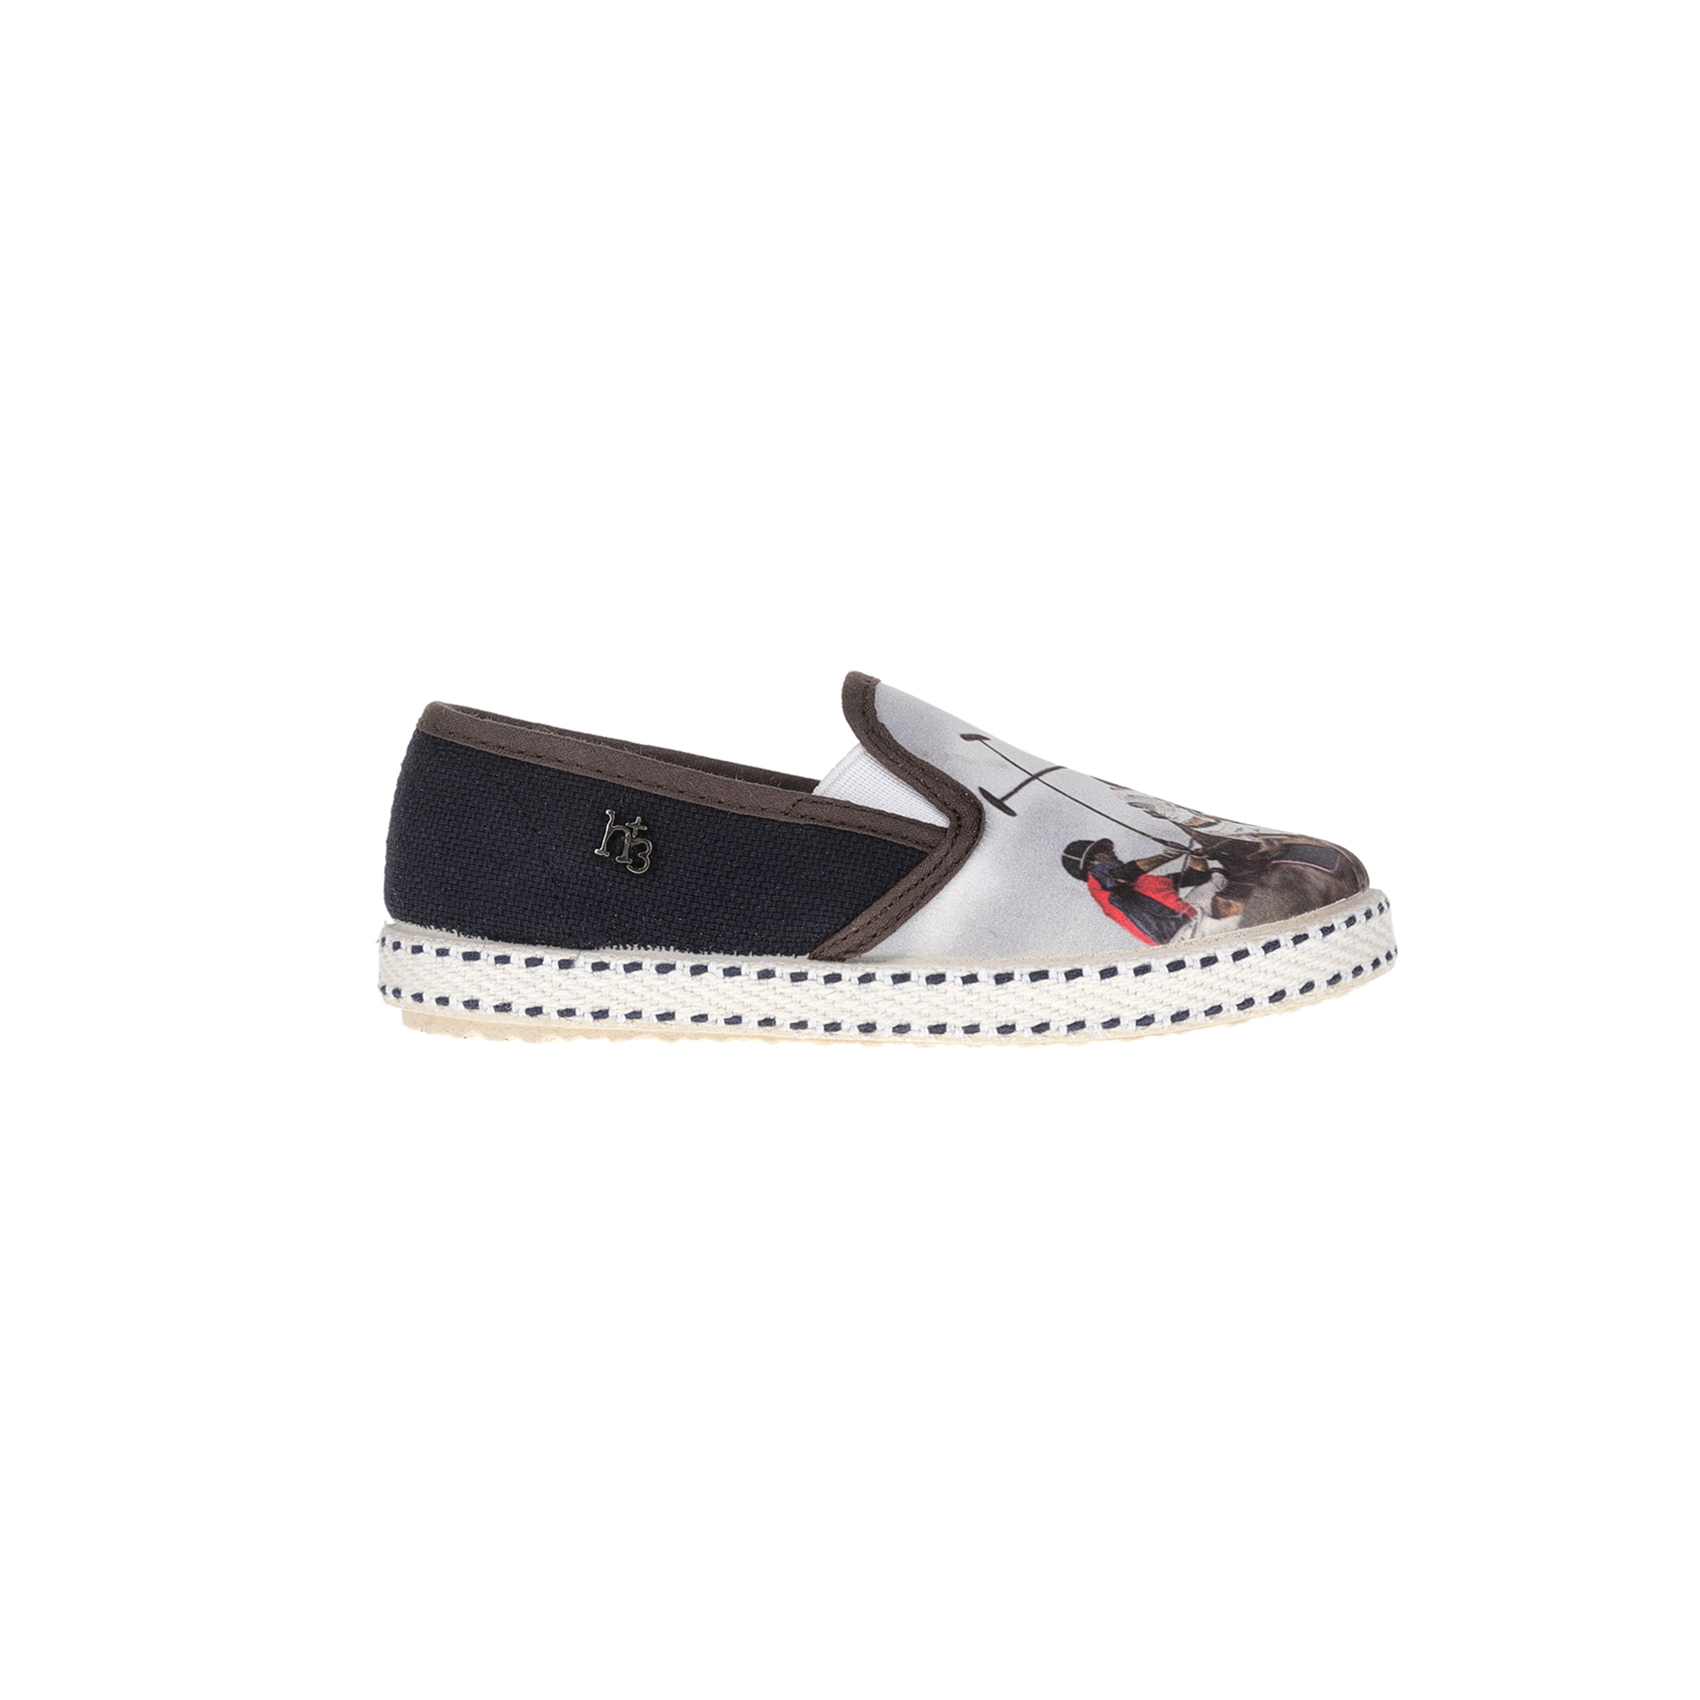 MONNALISA SHOES – Slip-on παπούτσια MONNALISA SHOES ST.POLO H+3 μπλε